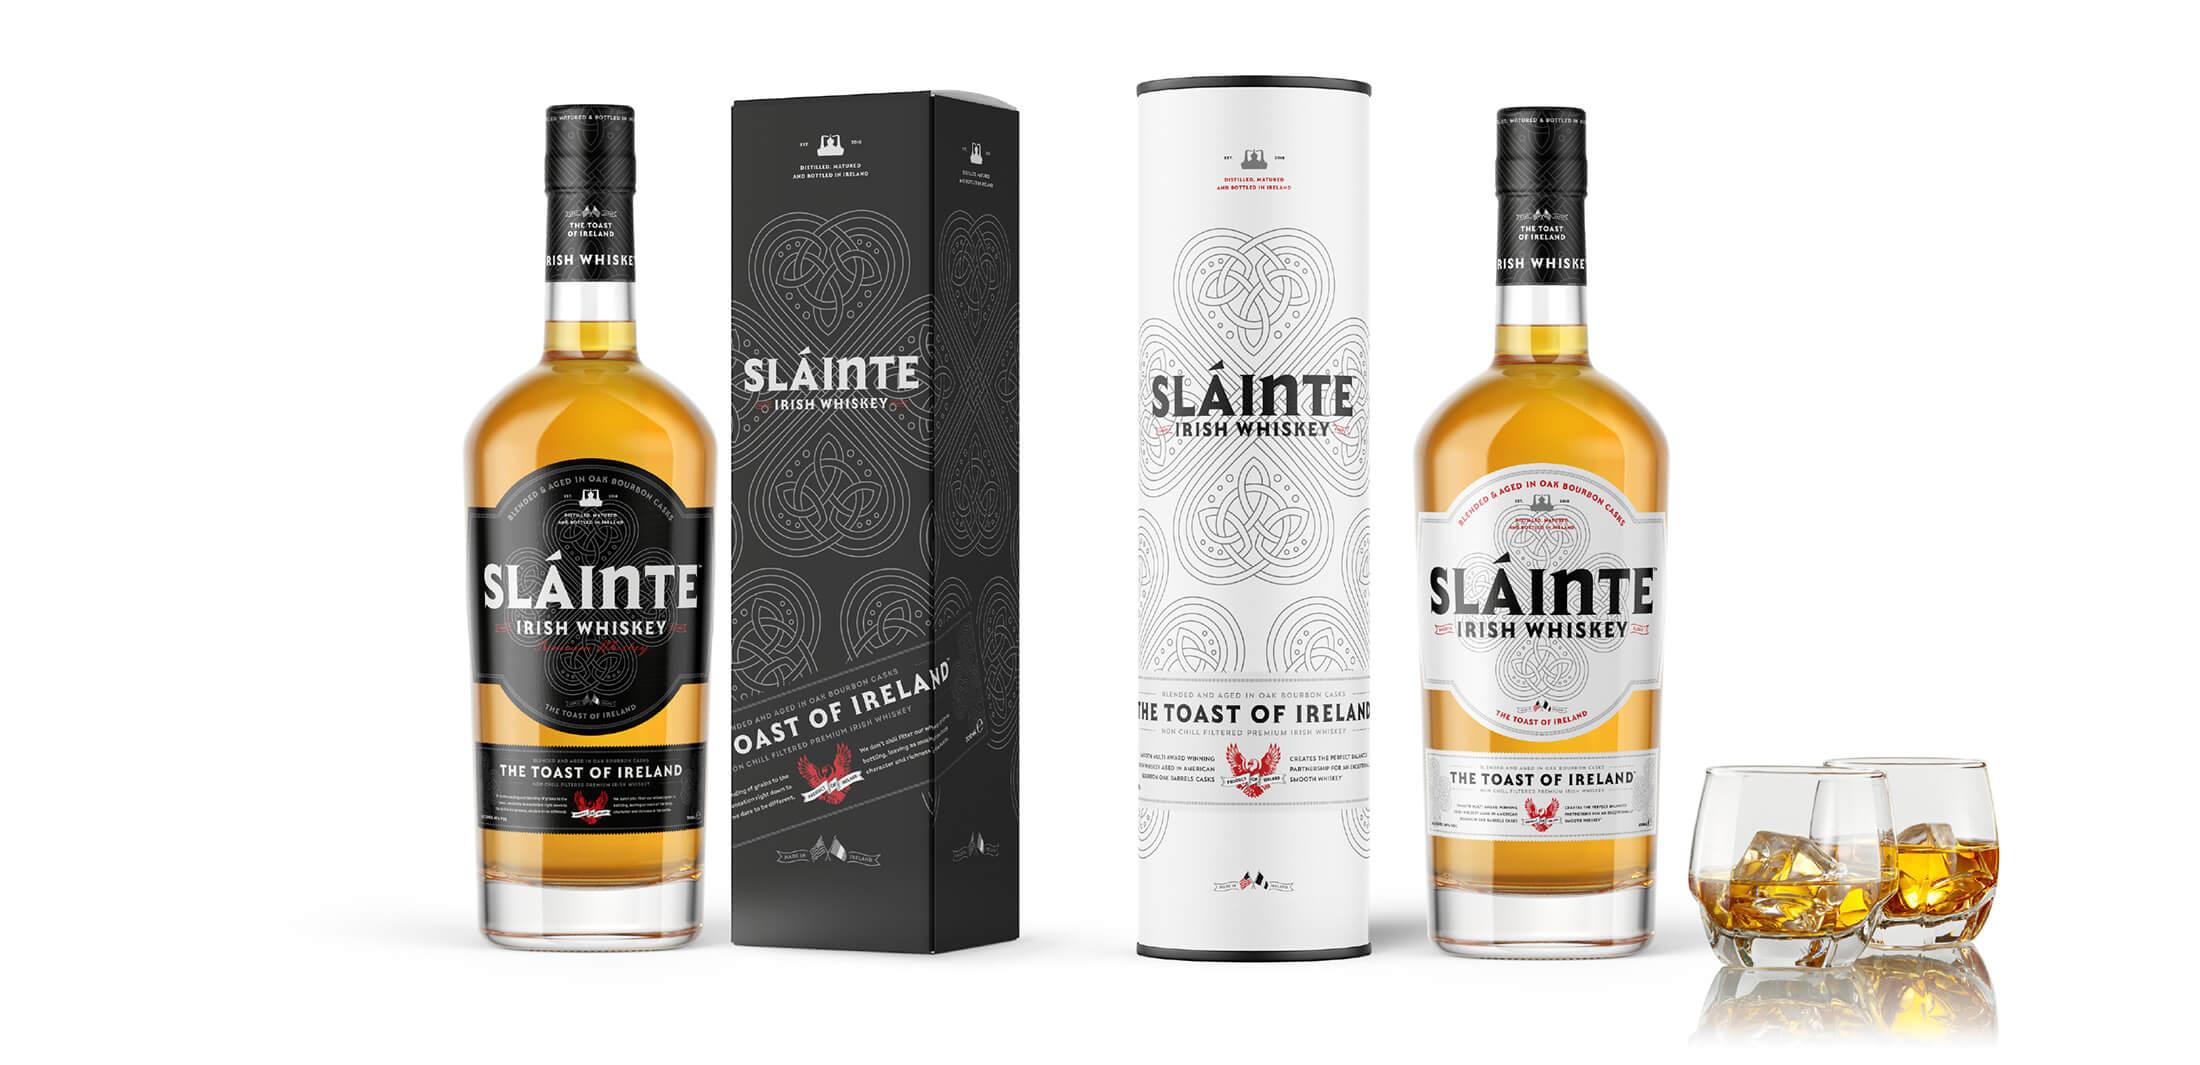 Slainte Irish Whiskey - Welcome to our family